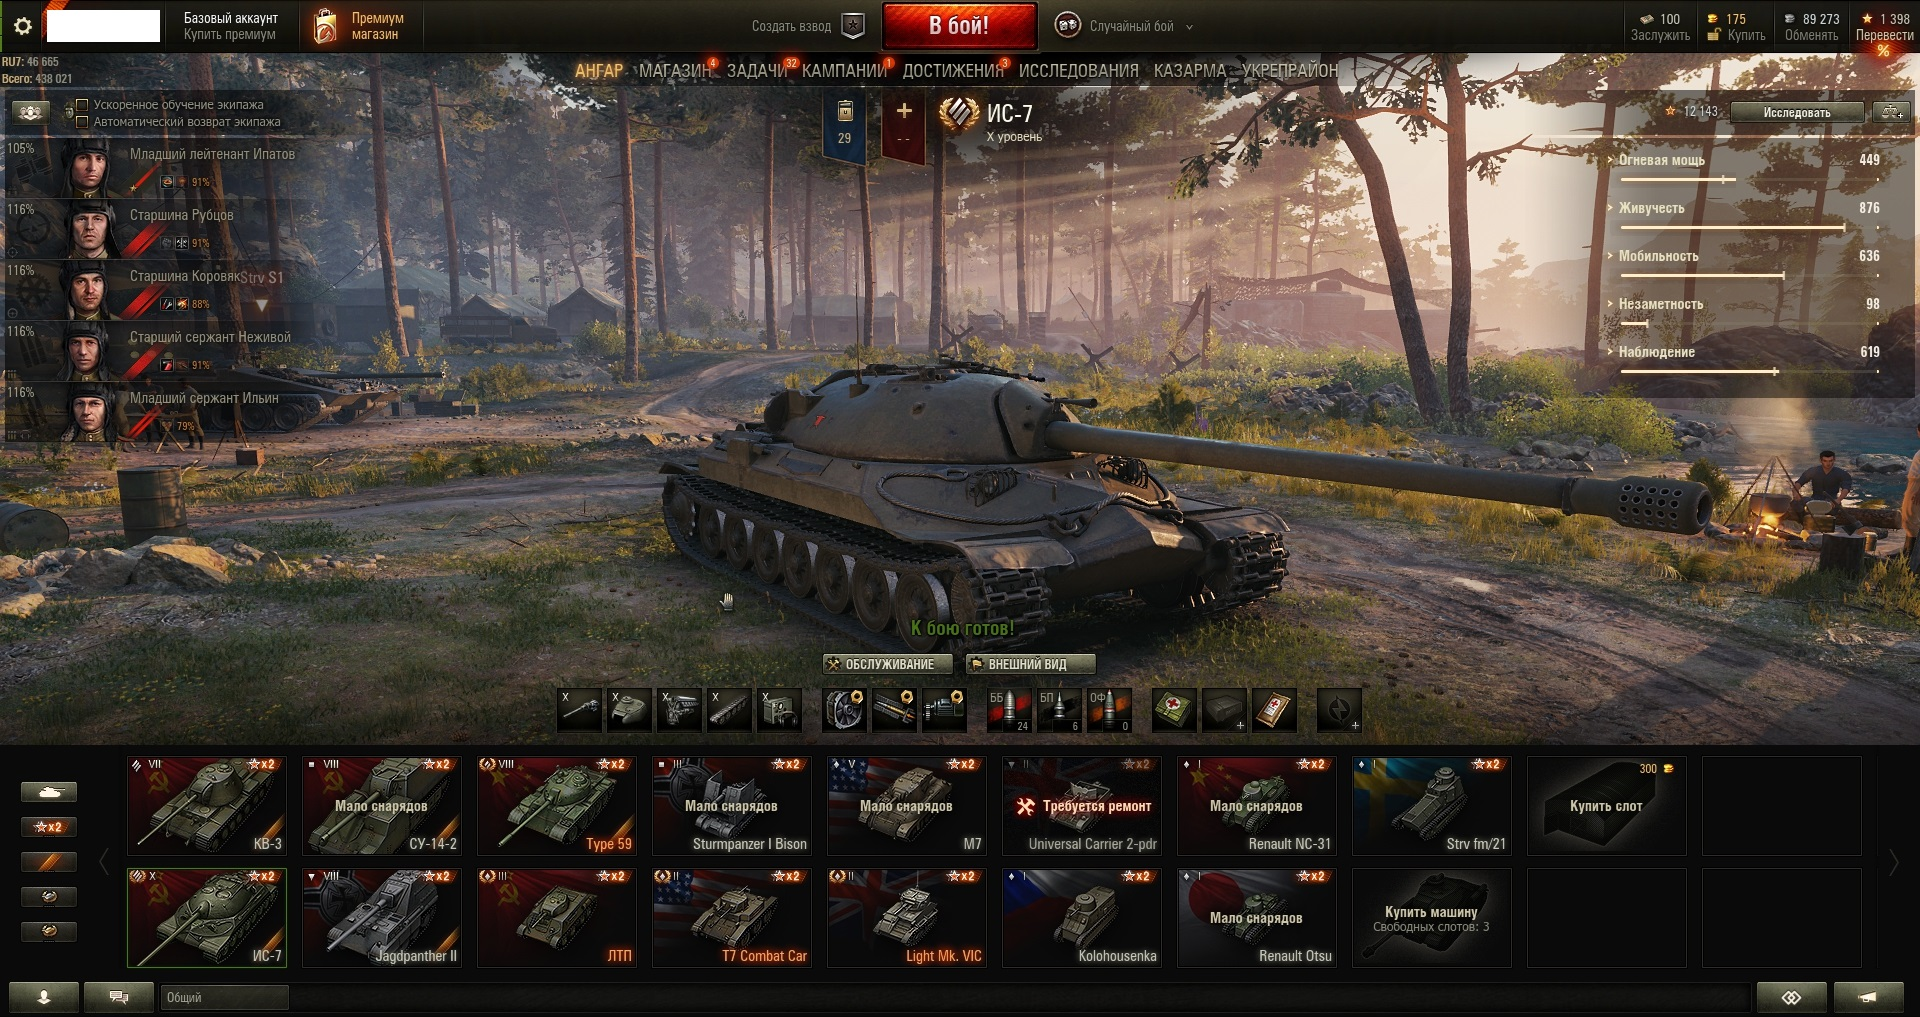 WoT World of Tanks Аккаунт с топами и привязками №09